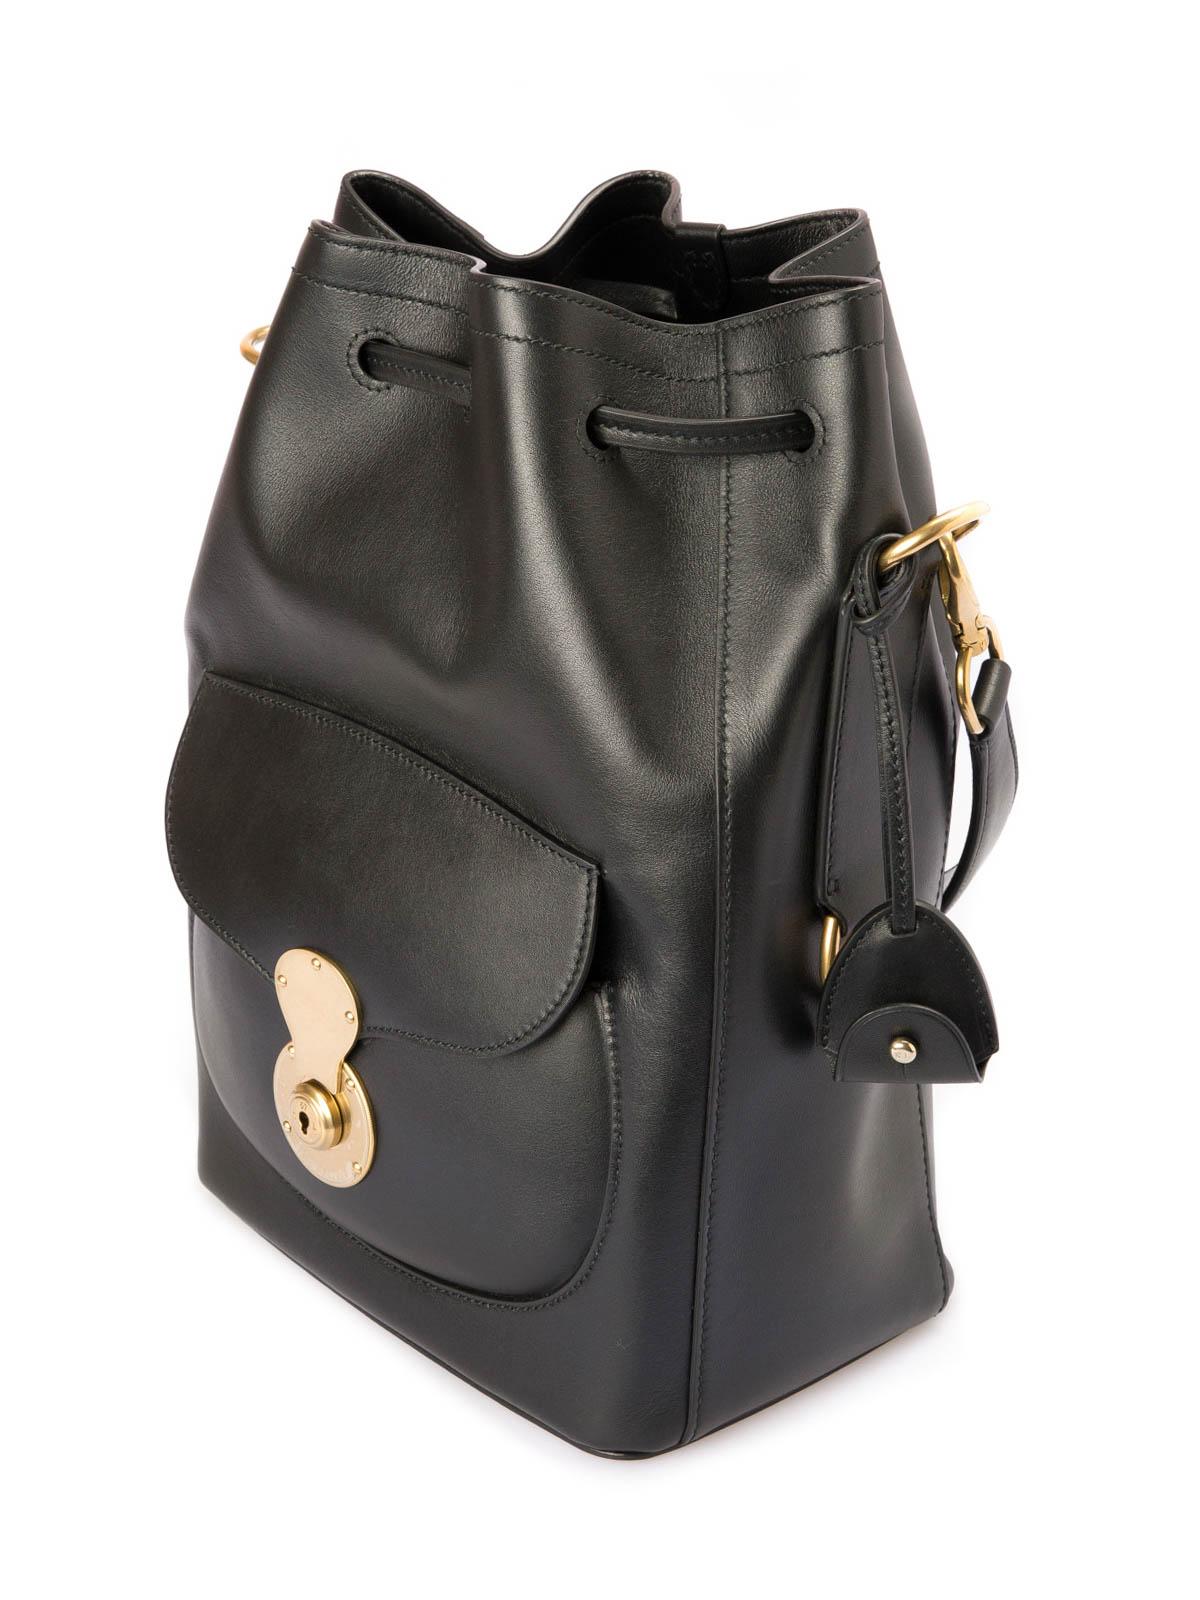 a7db7739f7ea Ralph Lauren - Leather bucket bag - کیف خمره ای - 69H ITP37 RAPPA A0001